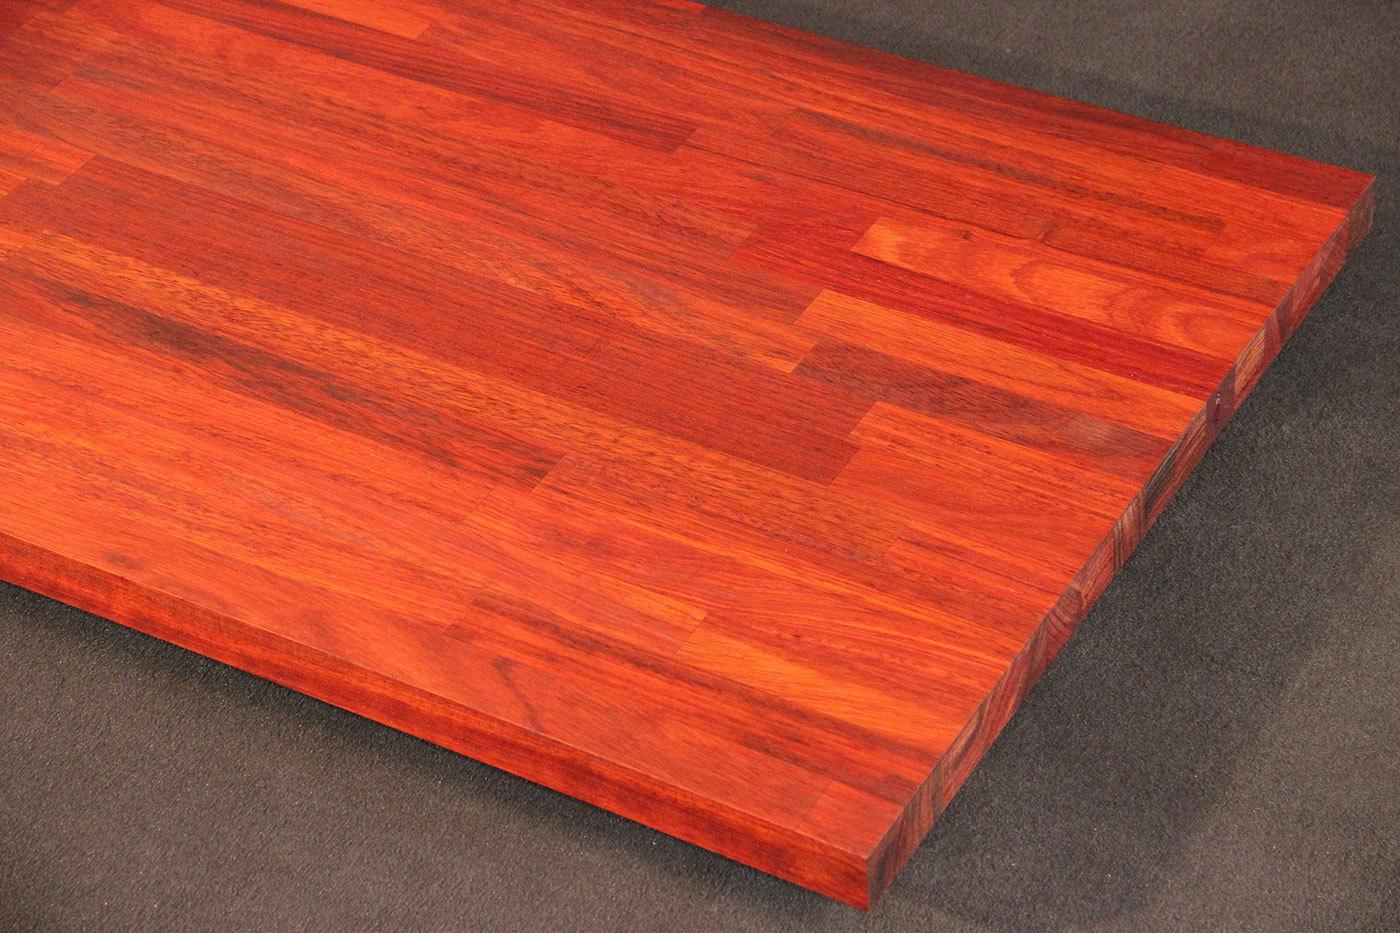 Küchenarbeitsplatte Massivholz Padouk 40/3050/650